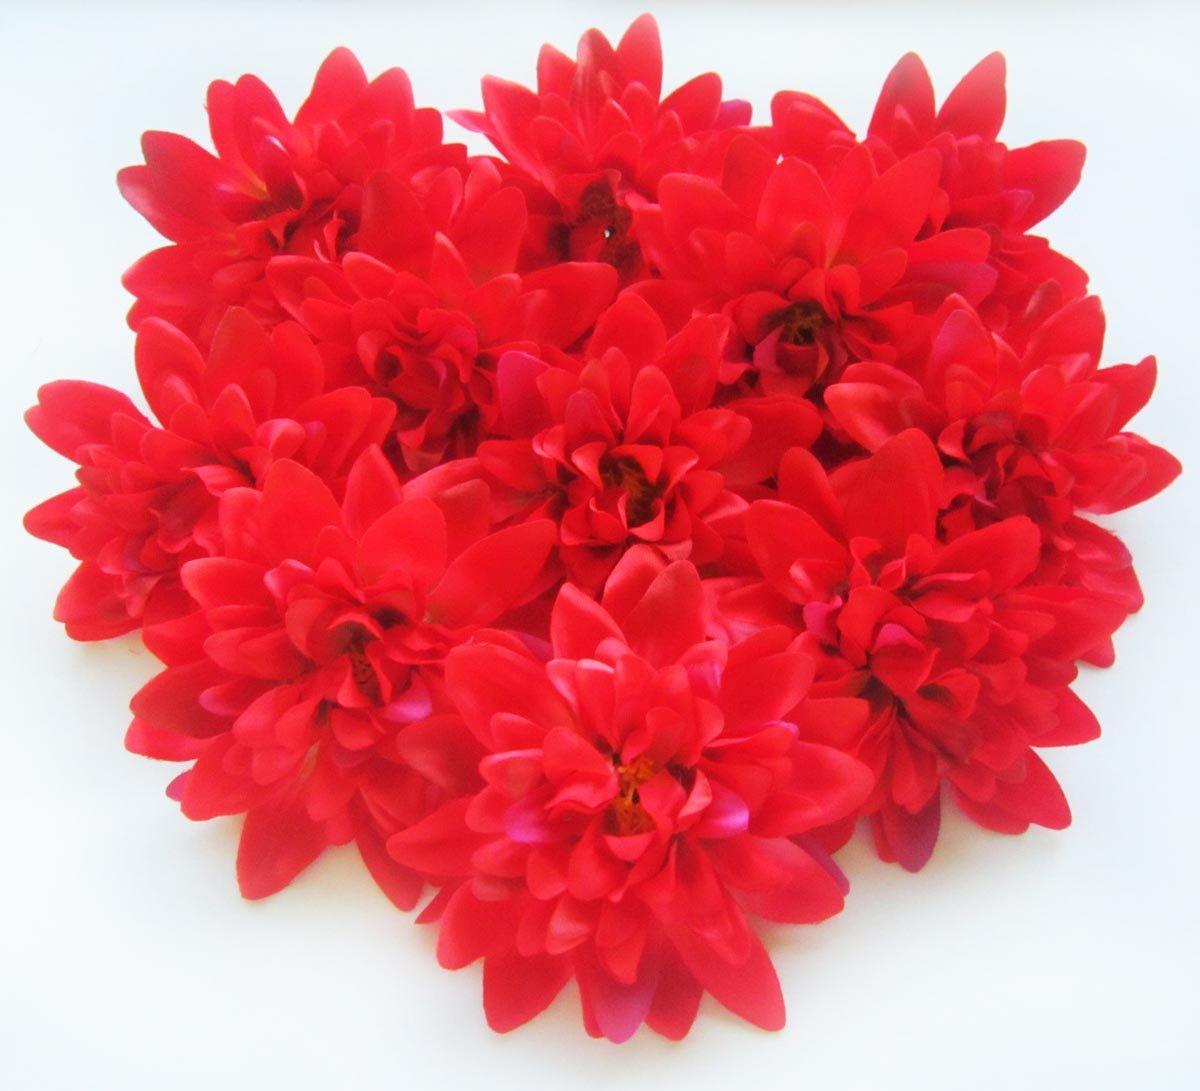 12-Red-Silk-Dahlia-Flower-Heads-4-Artificial-Flowers-Dahlias-Head-Fabric-Floral-Supplies-Wholesale-Lot-for-Wedding-Flowers-Accessories-Make-Bridal-Hair-Clips-Headbands-Dress